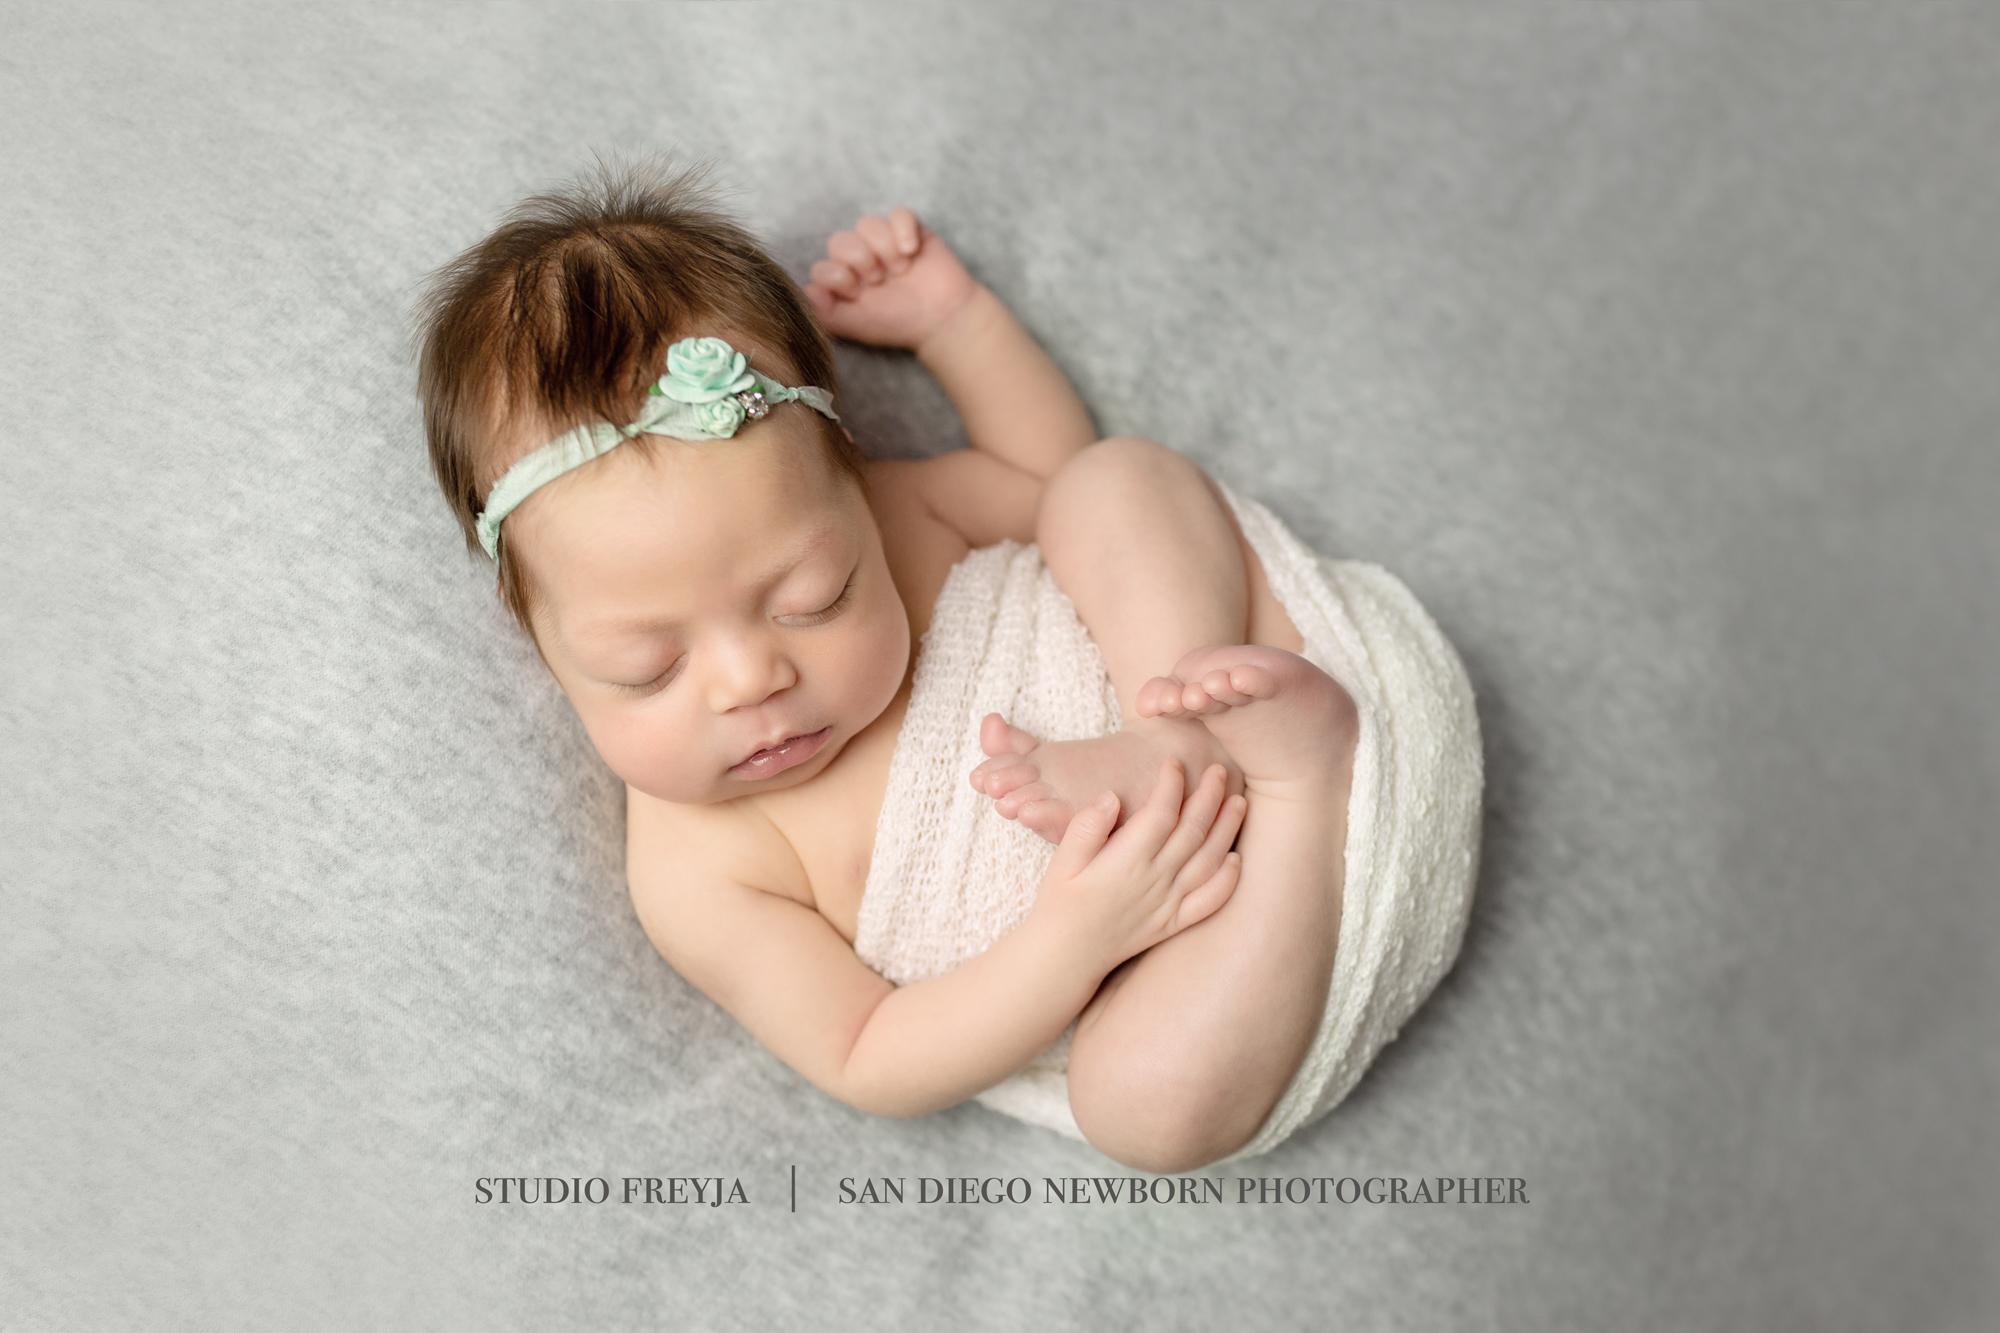 Raylee Newborn Session Copyright Studio Freyja  San Diego Newborn Photographer (5 of 7).jpg